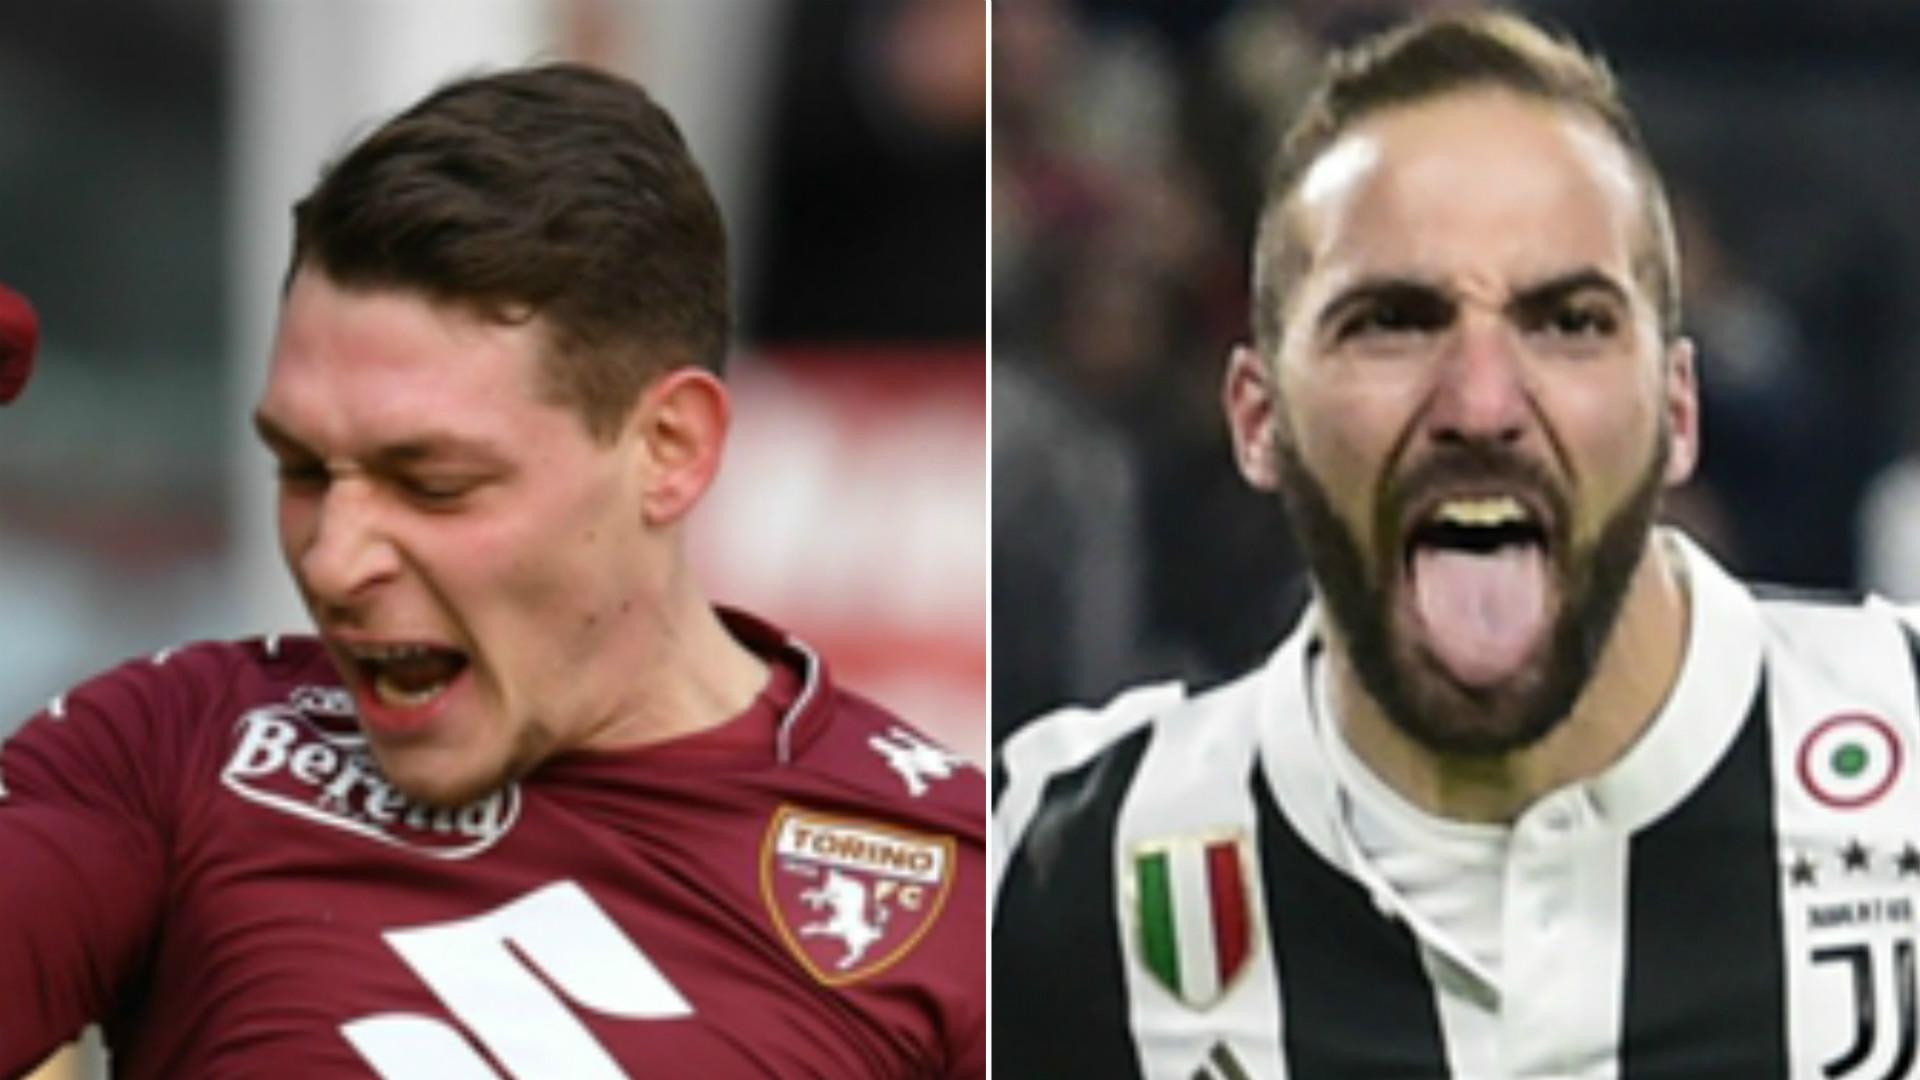 Torino-Juventus, Chiellini a rischio prova tv per una manata a Belotti